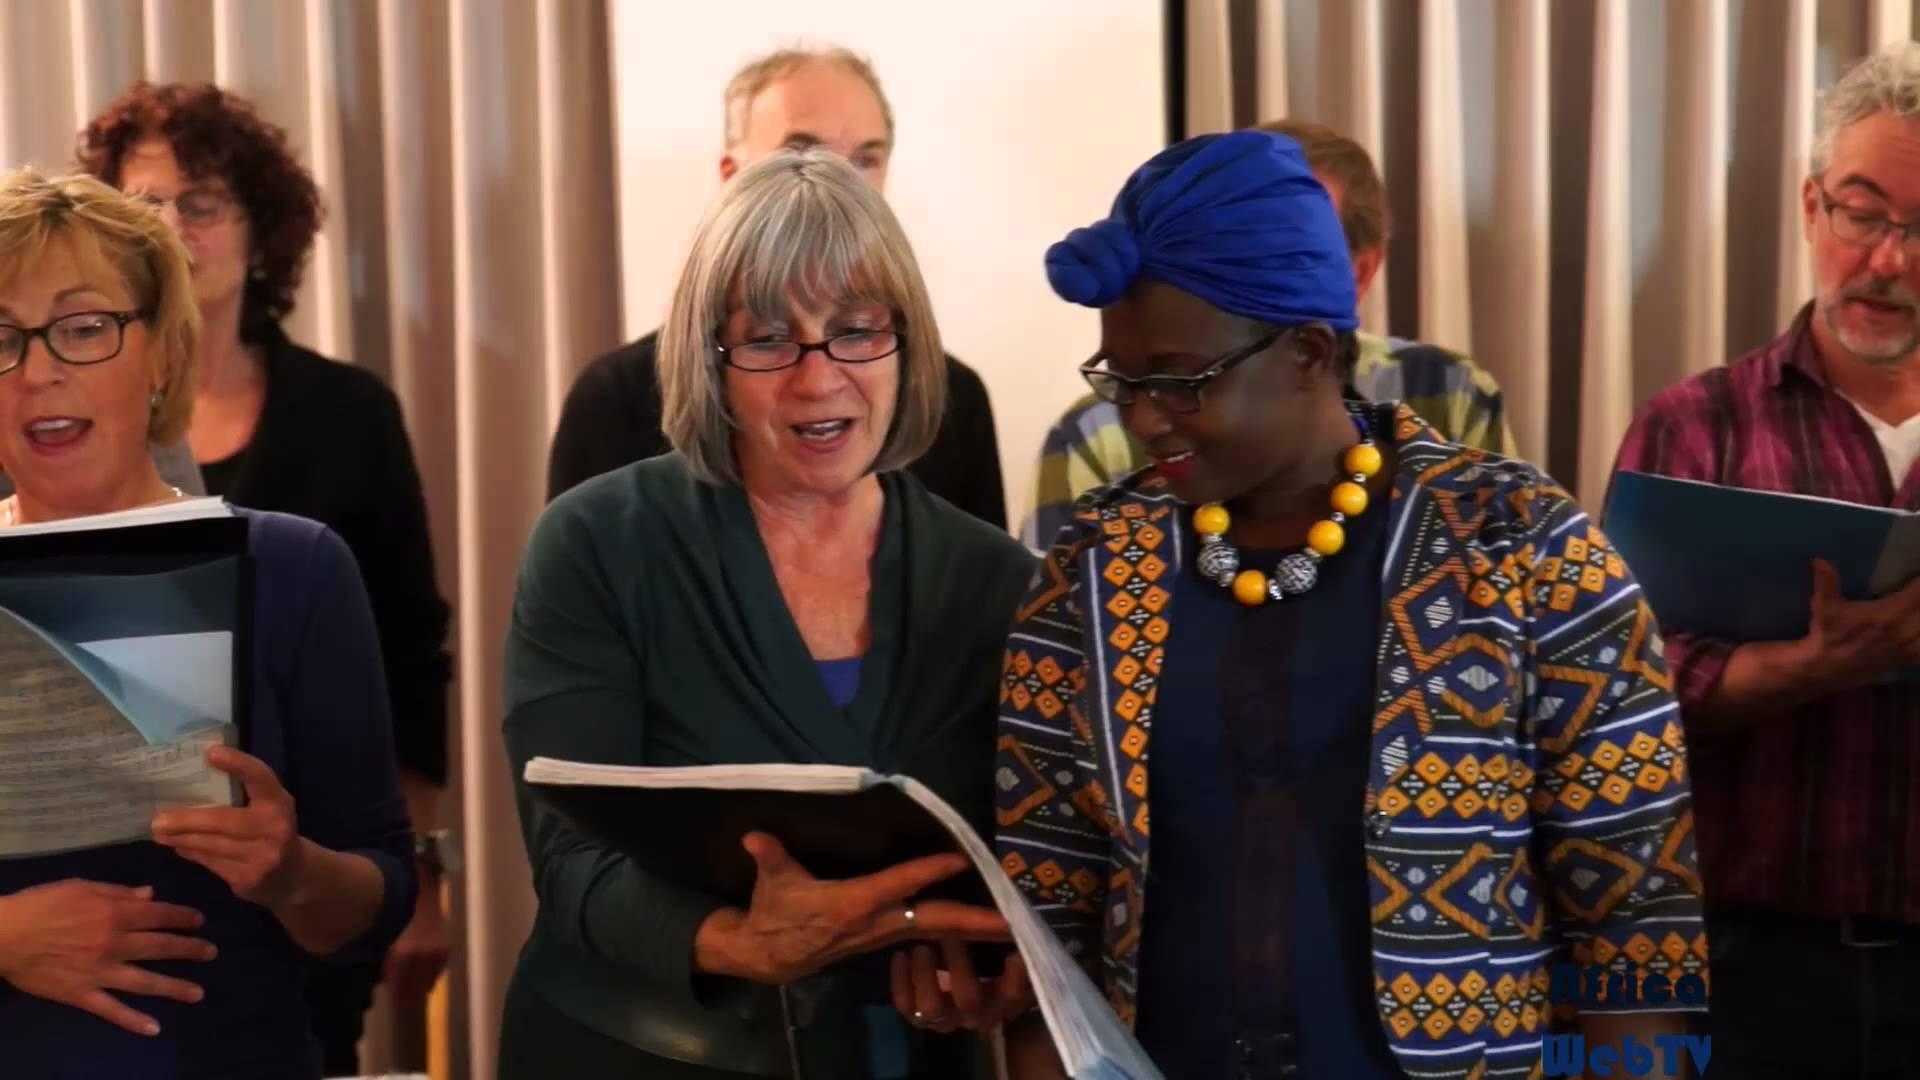 Eliane Nininahazwe – Fun with the choir!